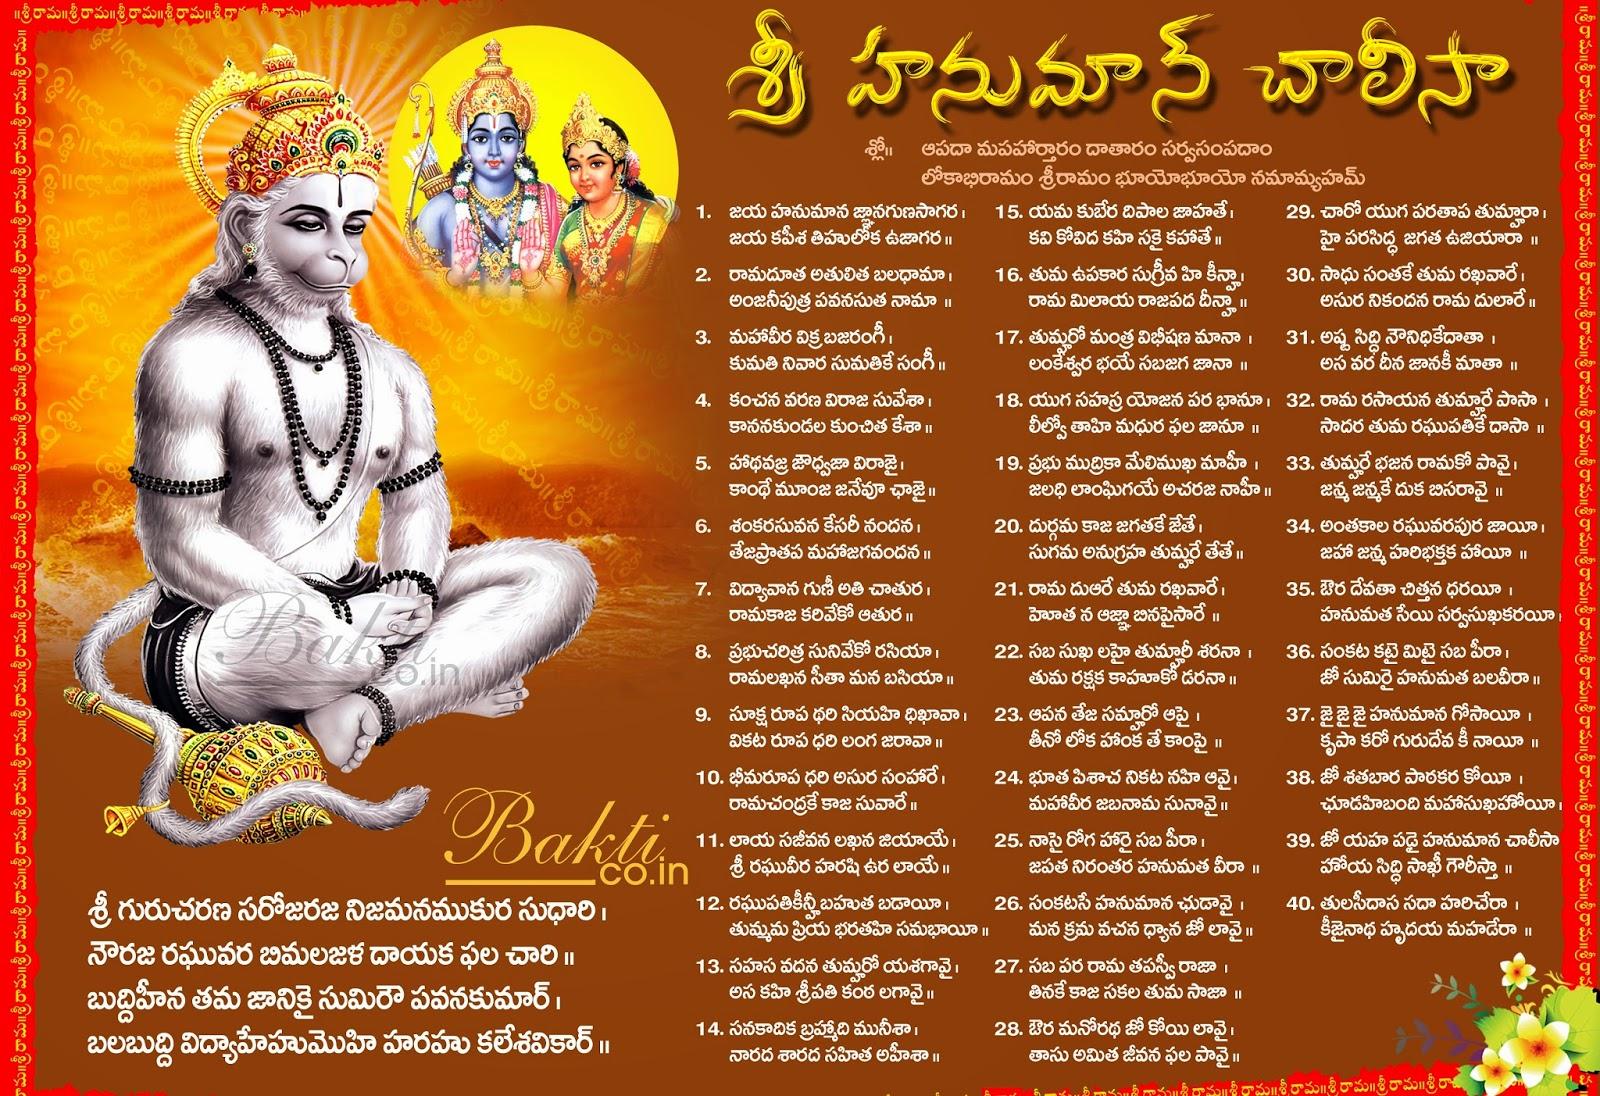 Telugu Hanuman Chalisa | naveengfx